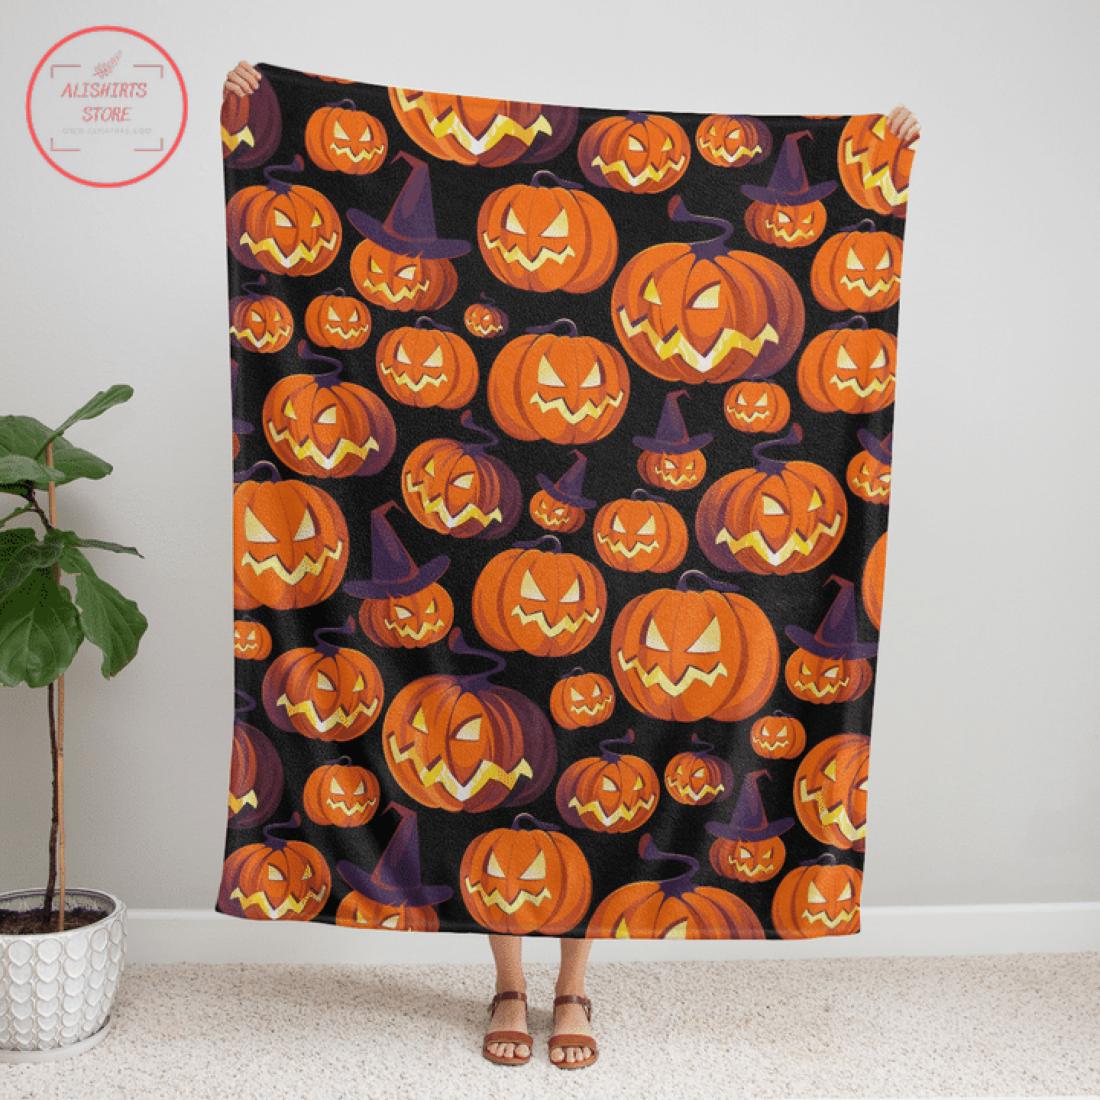 Pumpkin Halloween Scary Blanket